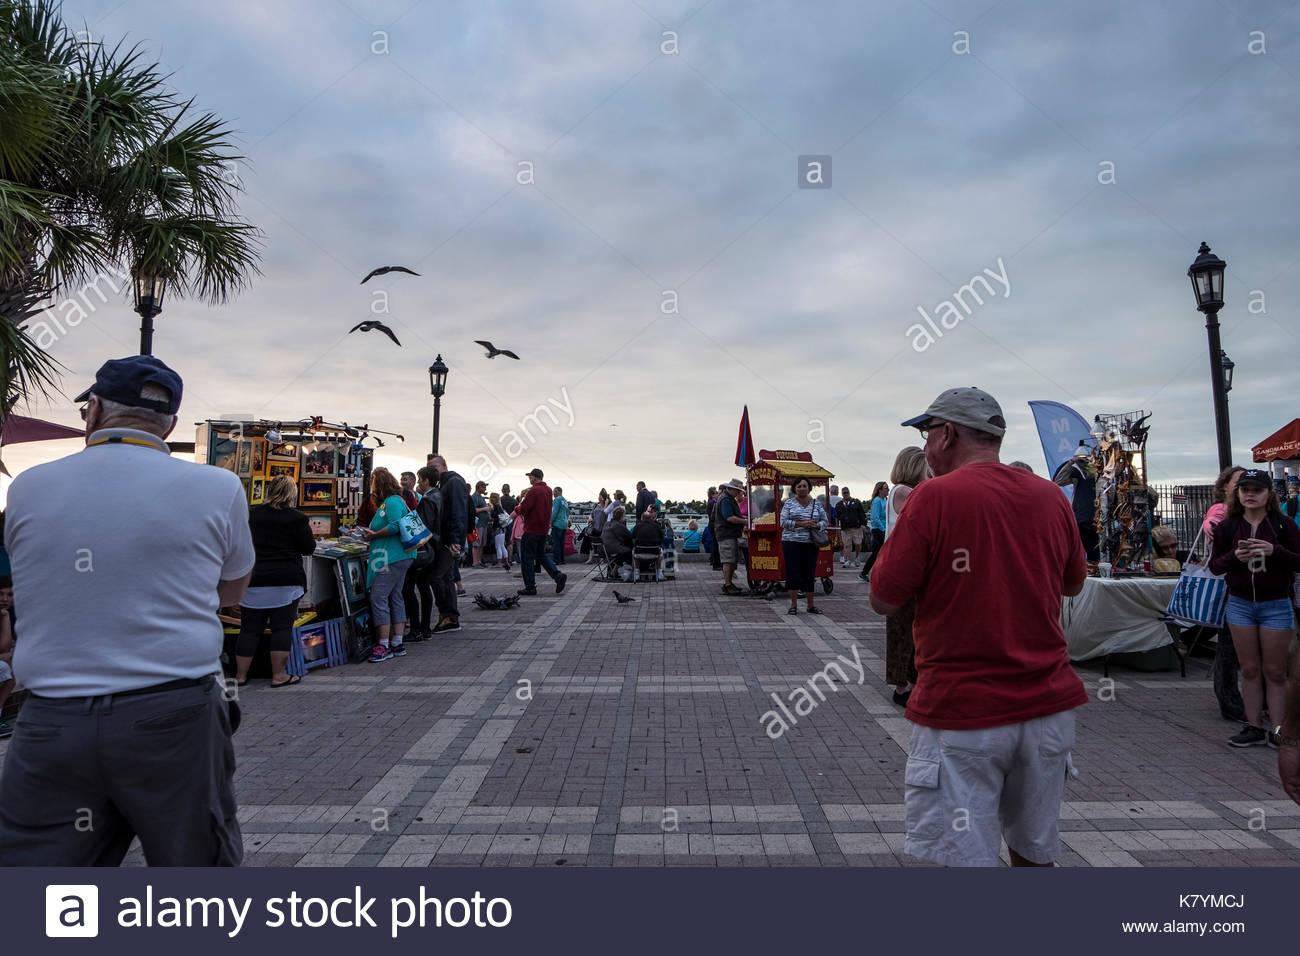 PICTURE OF FLORIDA KEYS - KEY WEST - KEY LARGO - BAHIA HONDA - KEY DEER - Stock Image